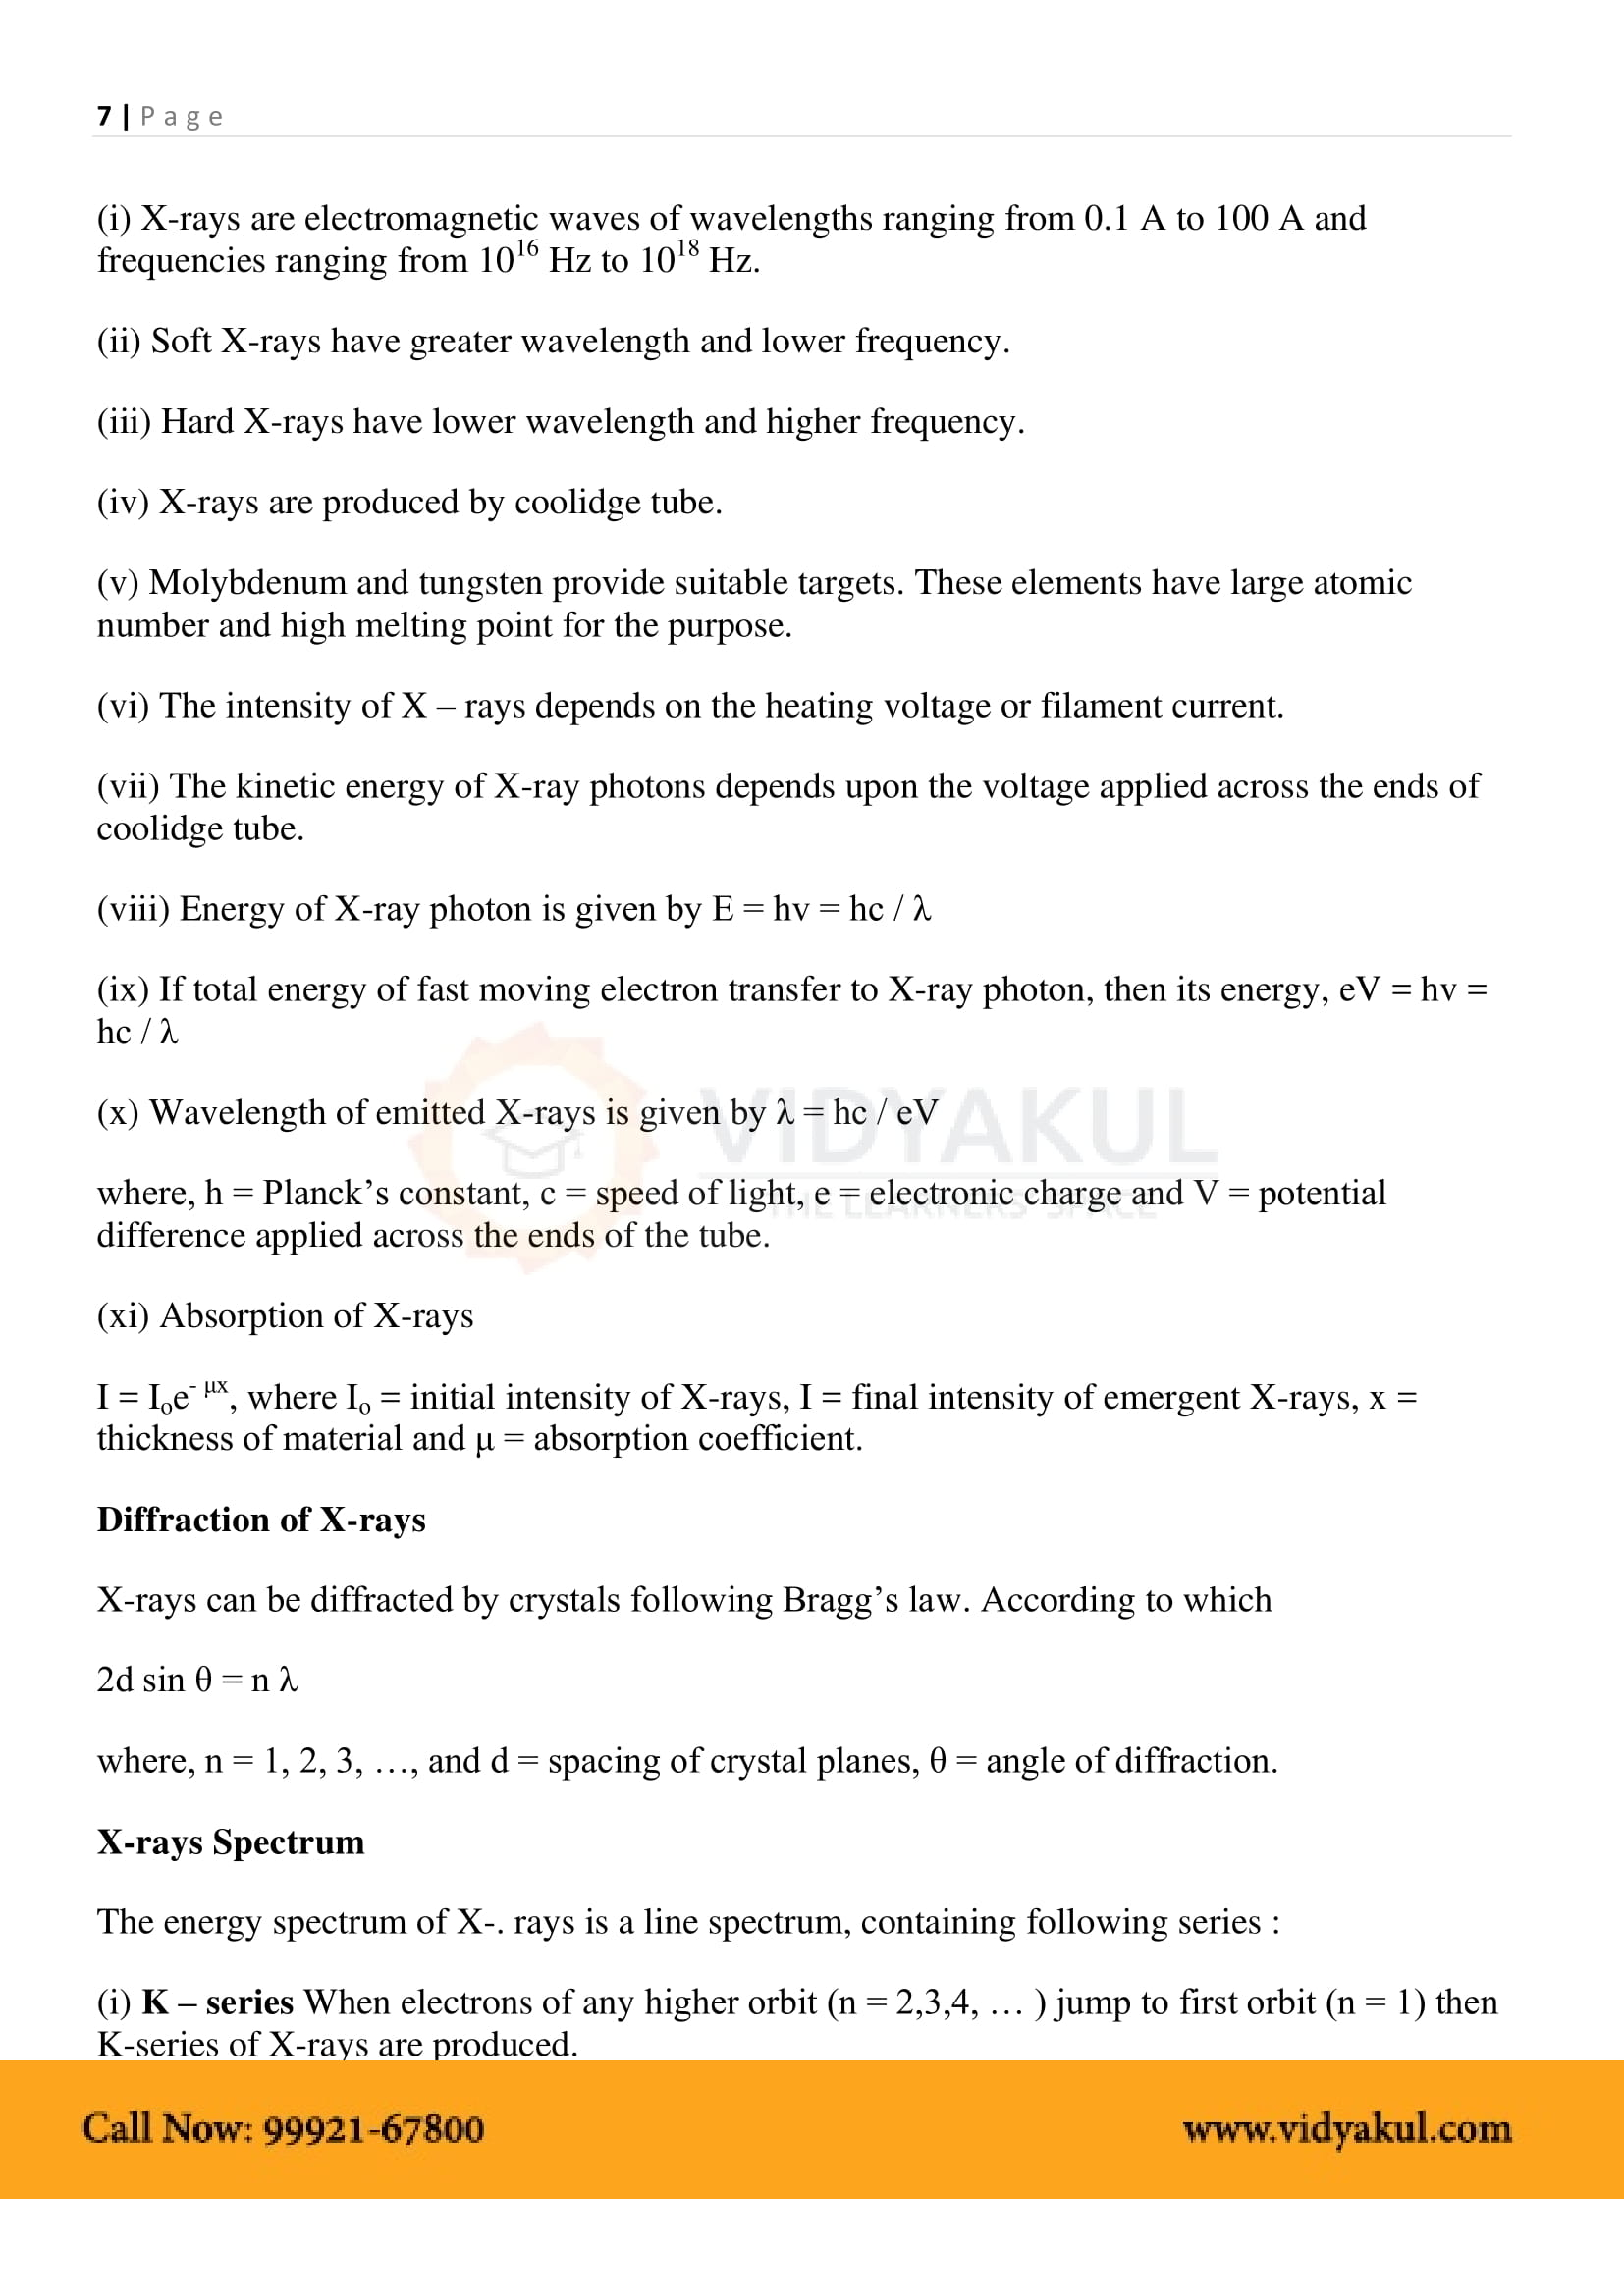 Dual Nature of Radiation and Matter Class 12 Notes   Vidyakul